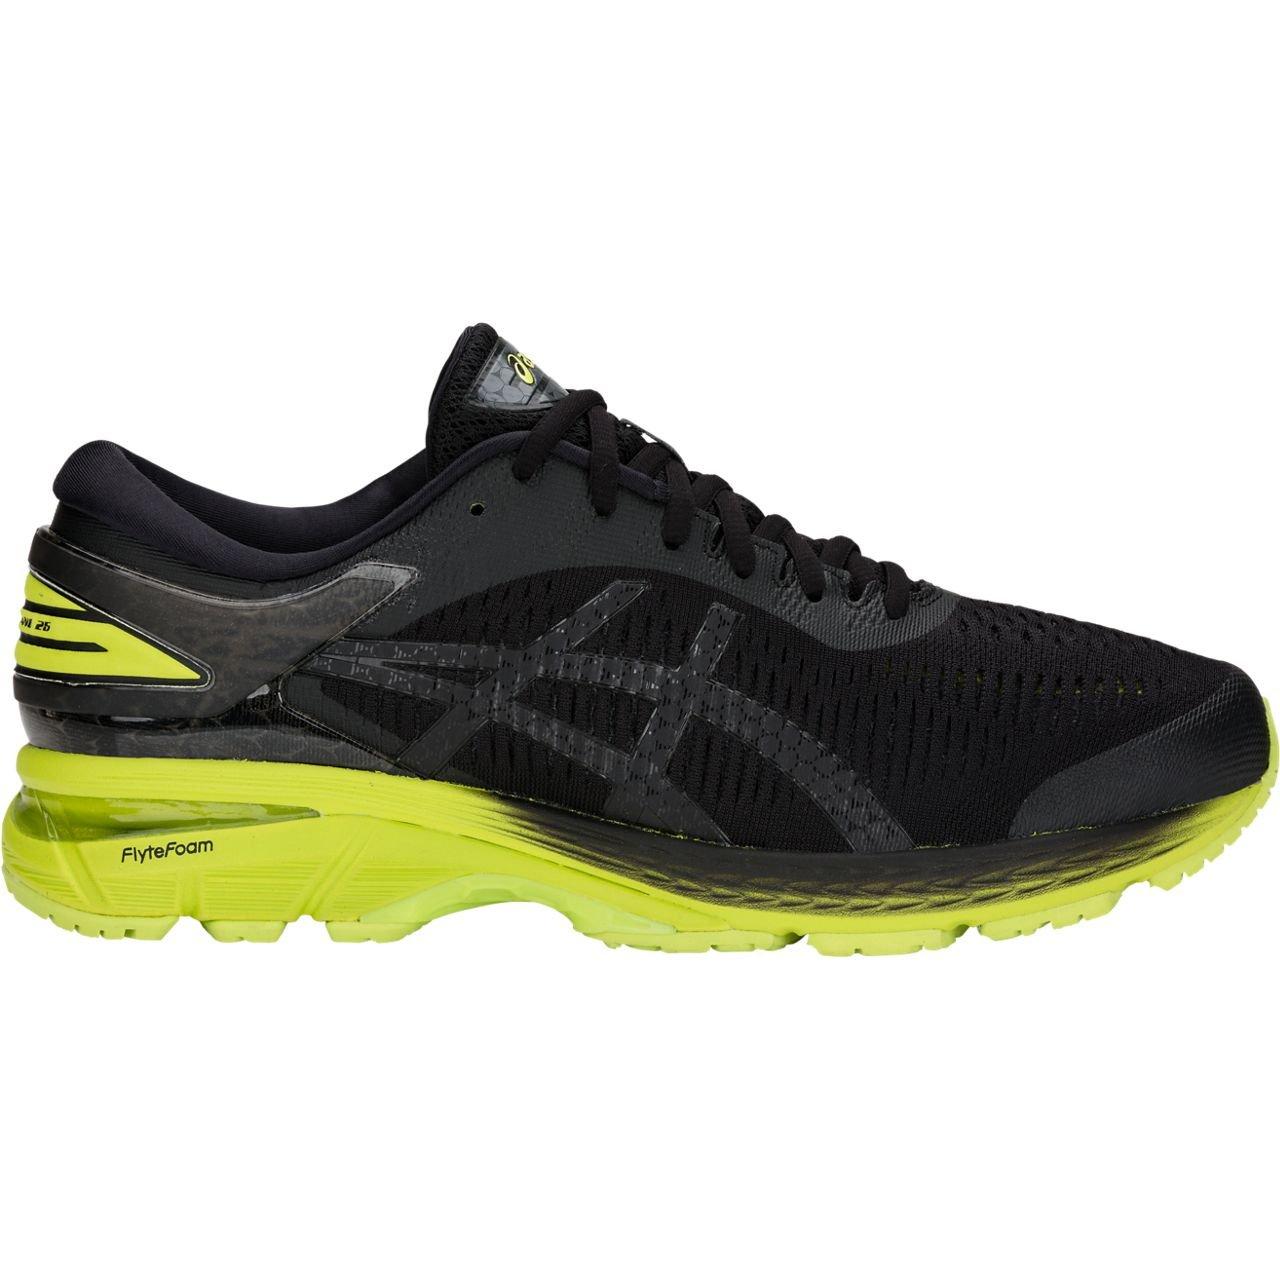 ASICS Gel-Kayano 25 Men's Running Shoe B077MQ6G11 11 D(M) US|Black/Neon Lime